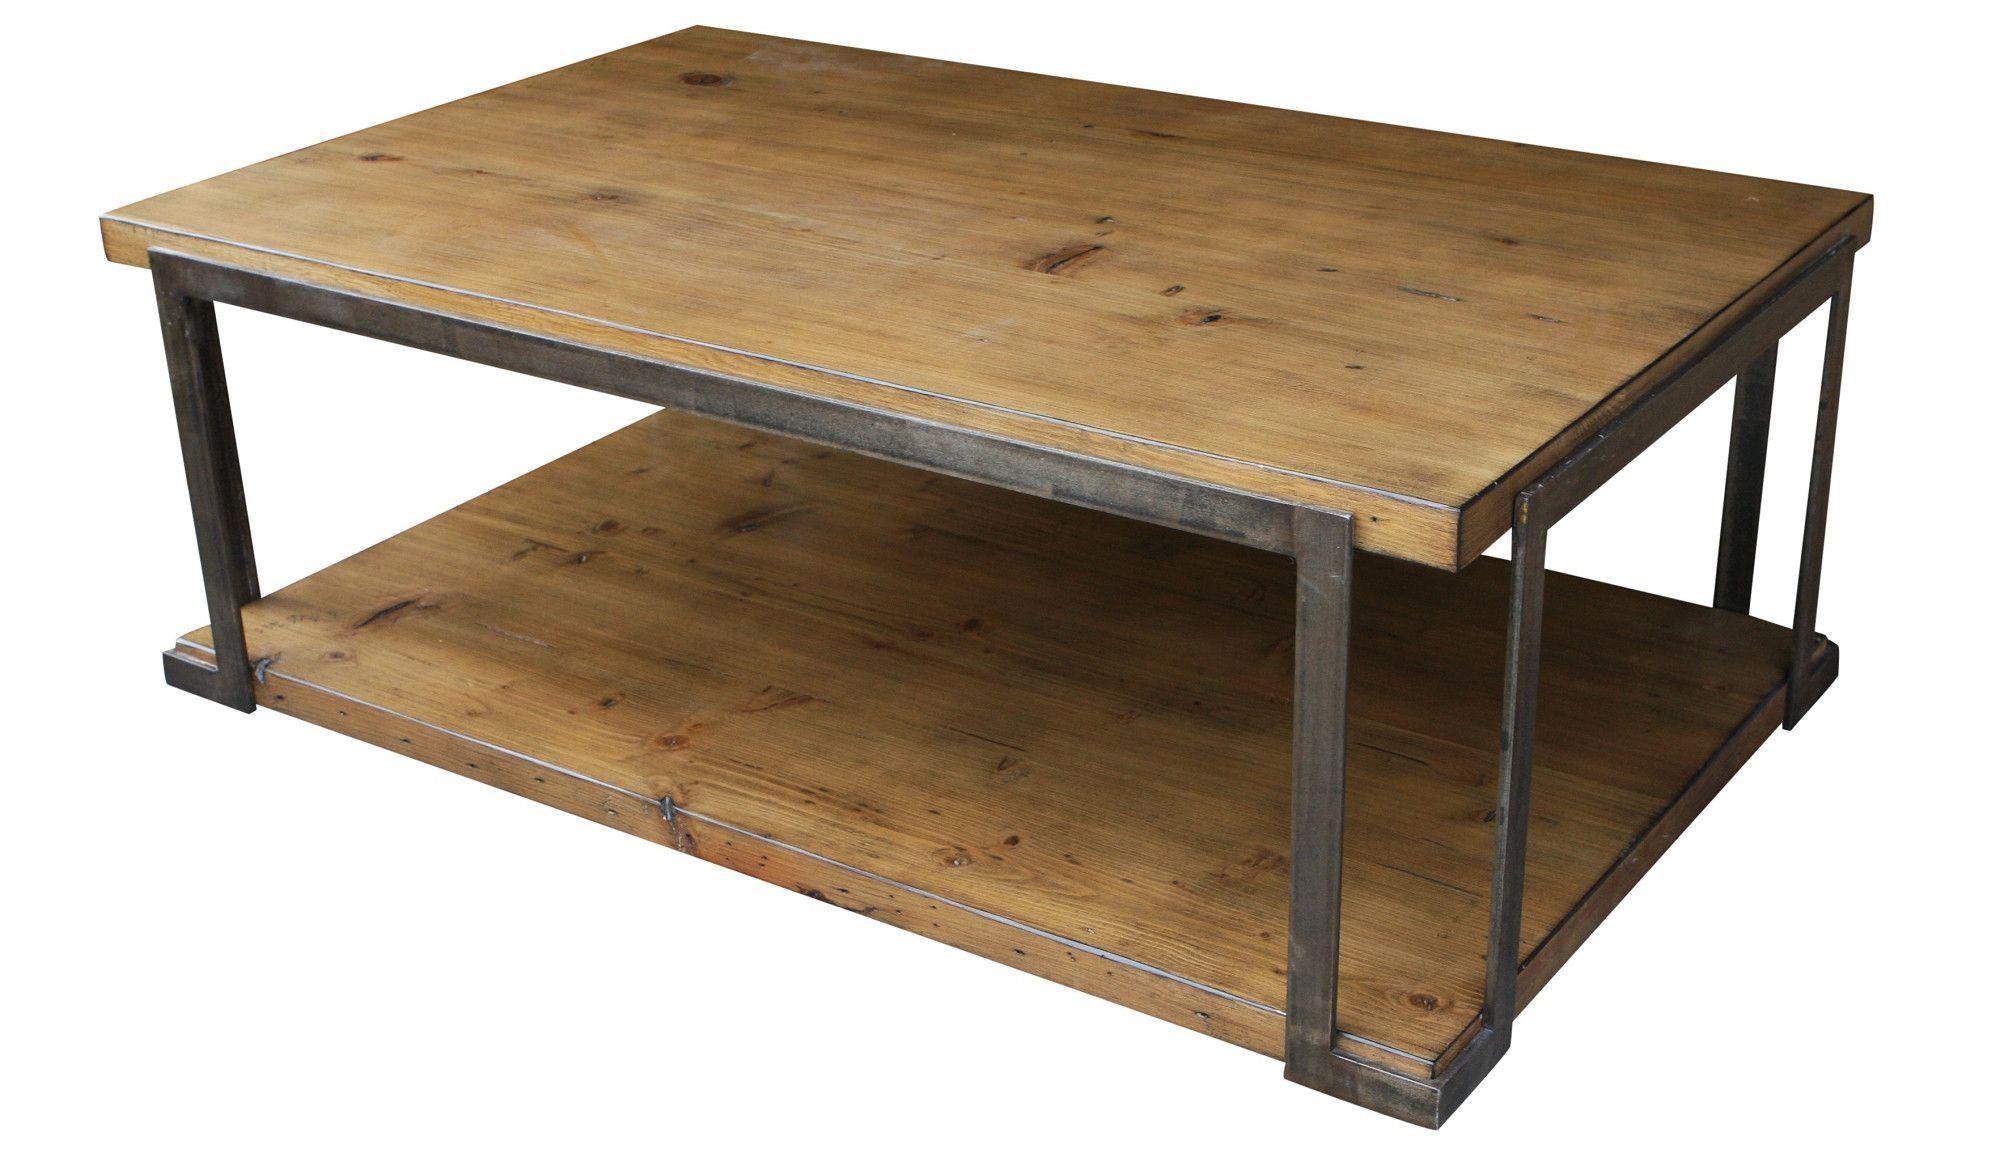 Organic Modern Industrial Coffee Table Modern Industrial Coffee Table Round Metal Coffee Table Coffee Table Wood [ 1170 x 2000 Pixel ]